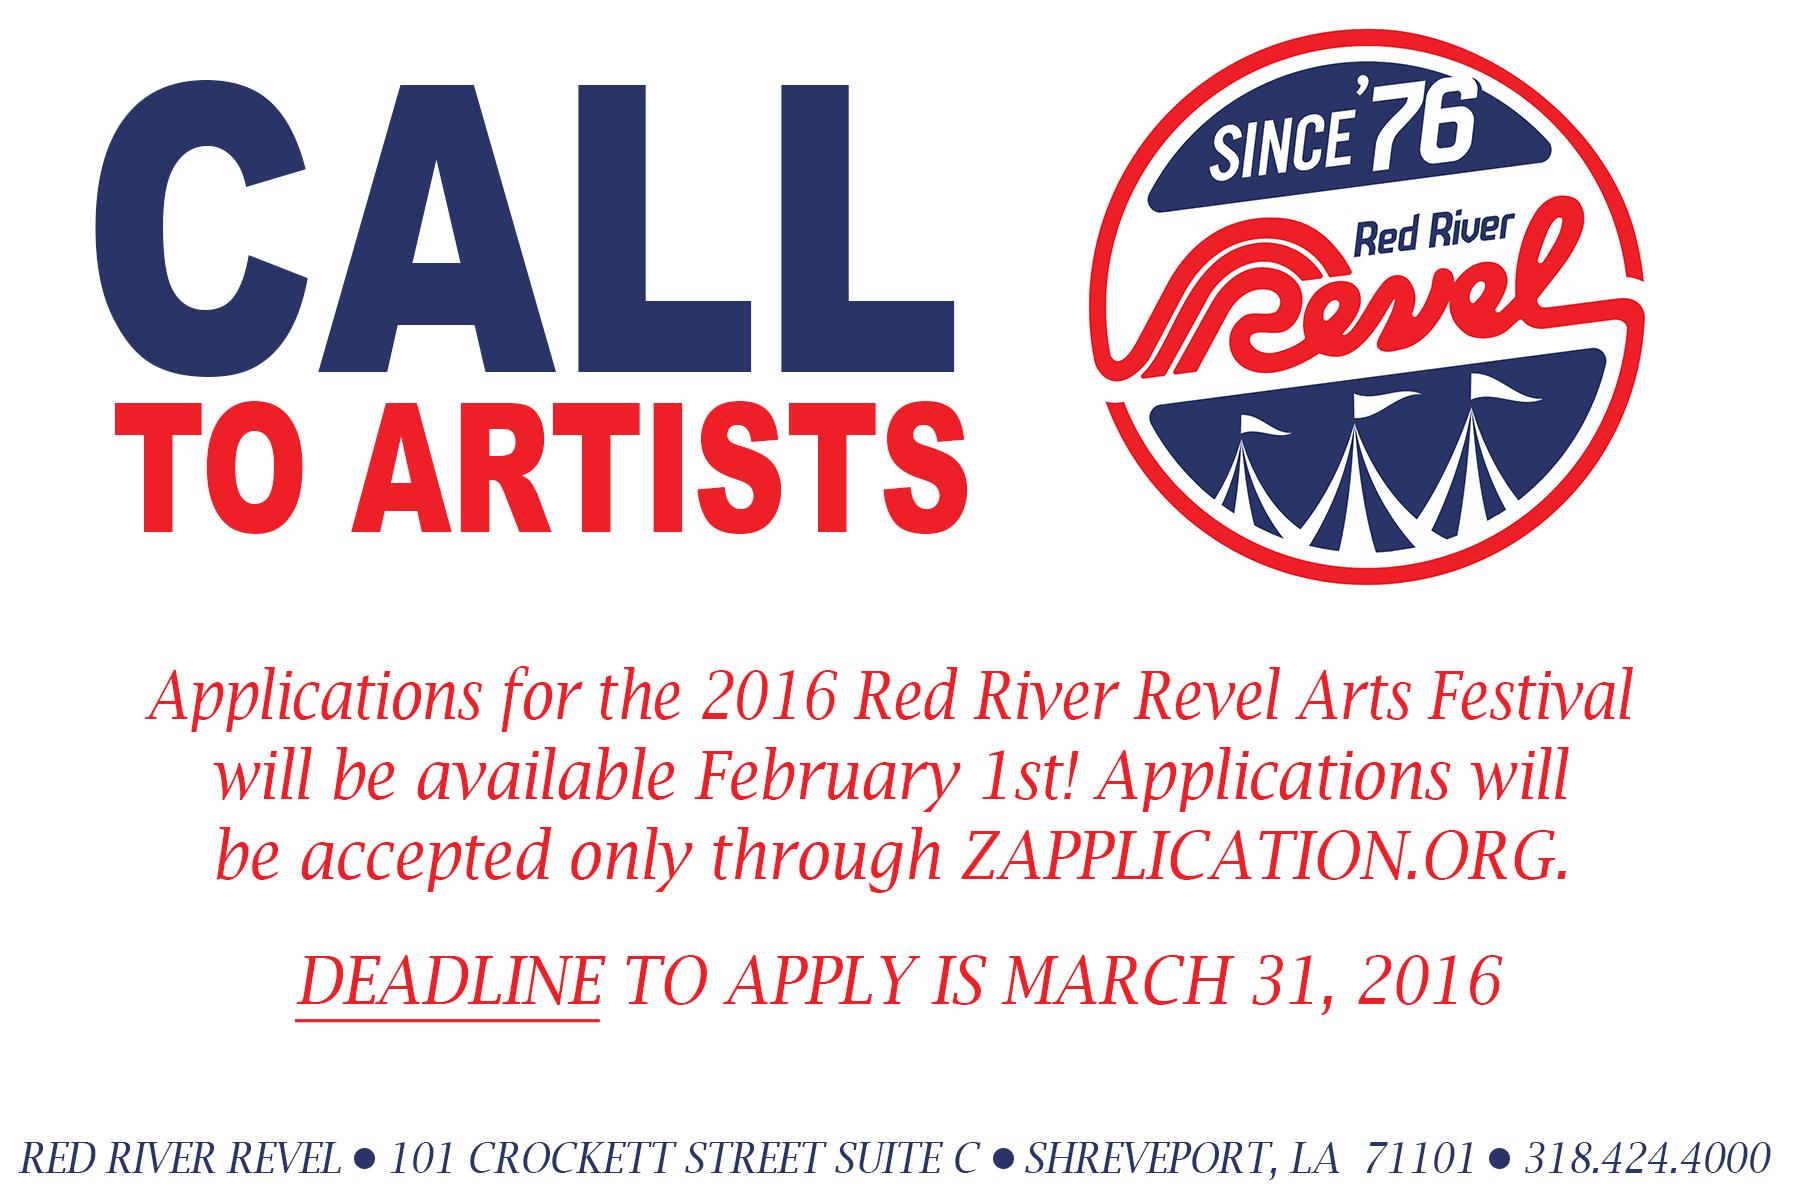 Red River Revel VISUAL ARTIST CALL